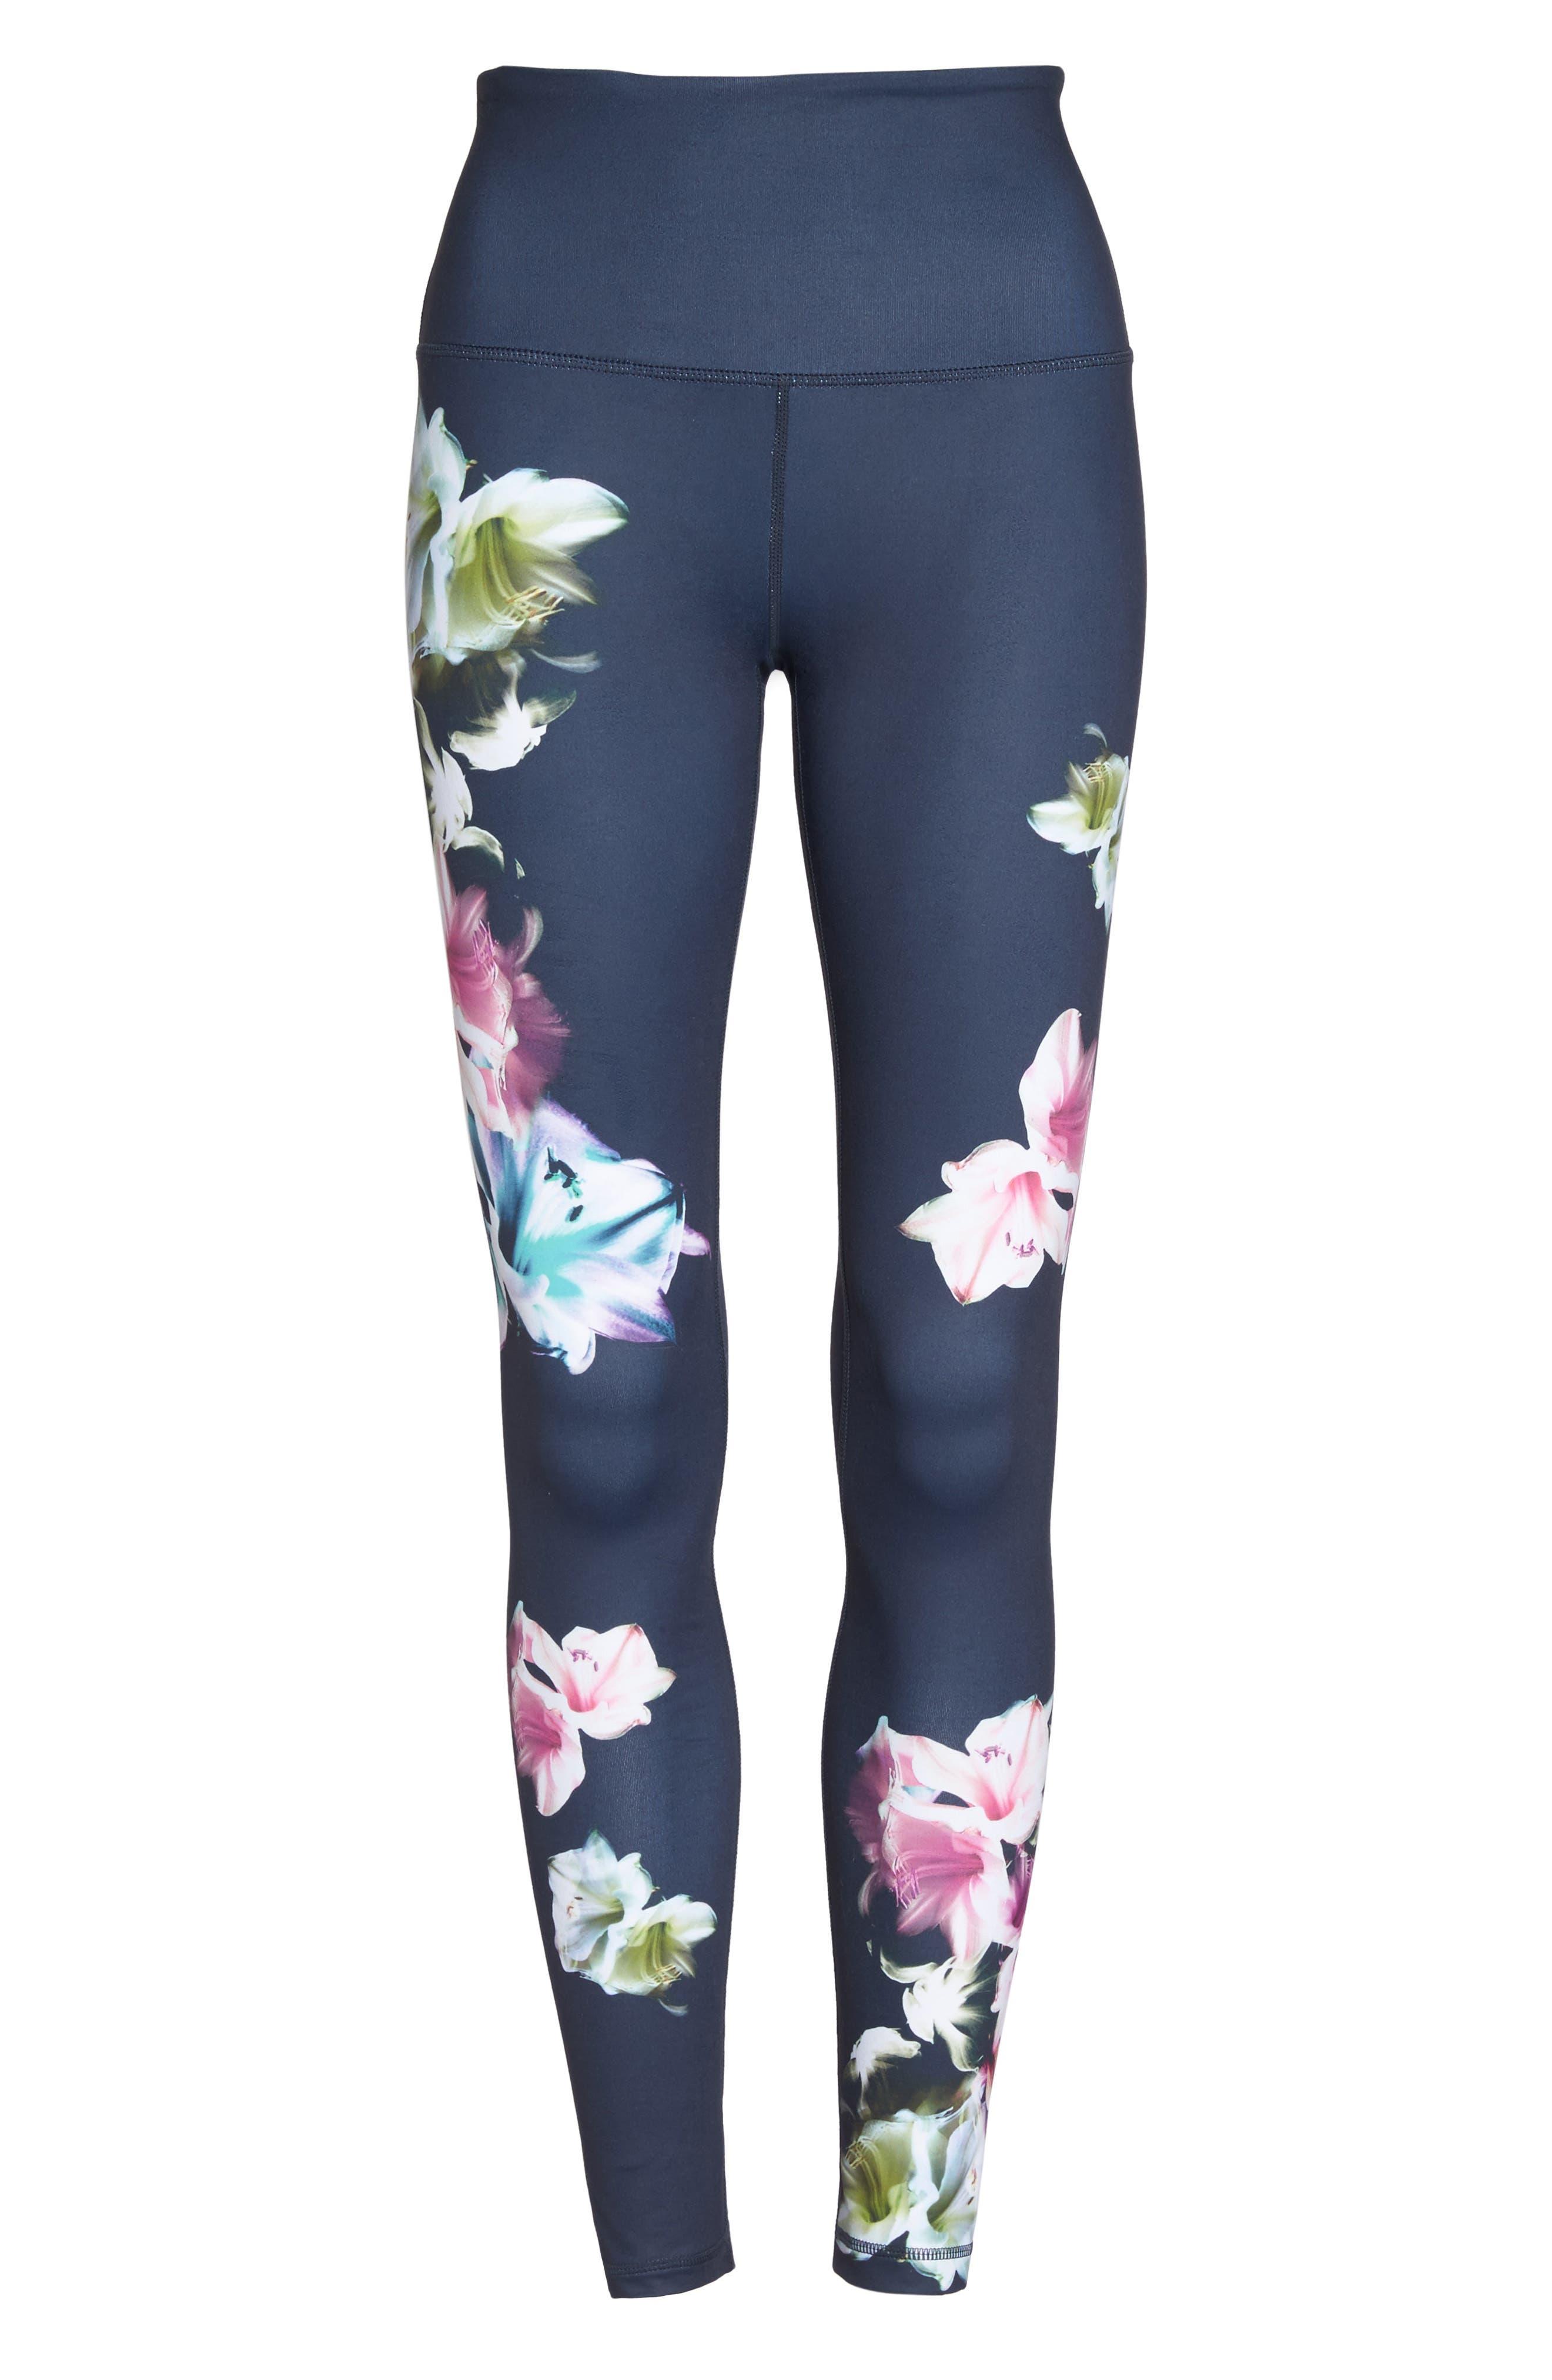 Pure Floral Ink High Waist Leggings,                             Alternate thumbnail 7, color,                             Grey Slate Floral Engineer Prt